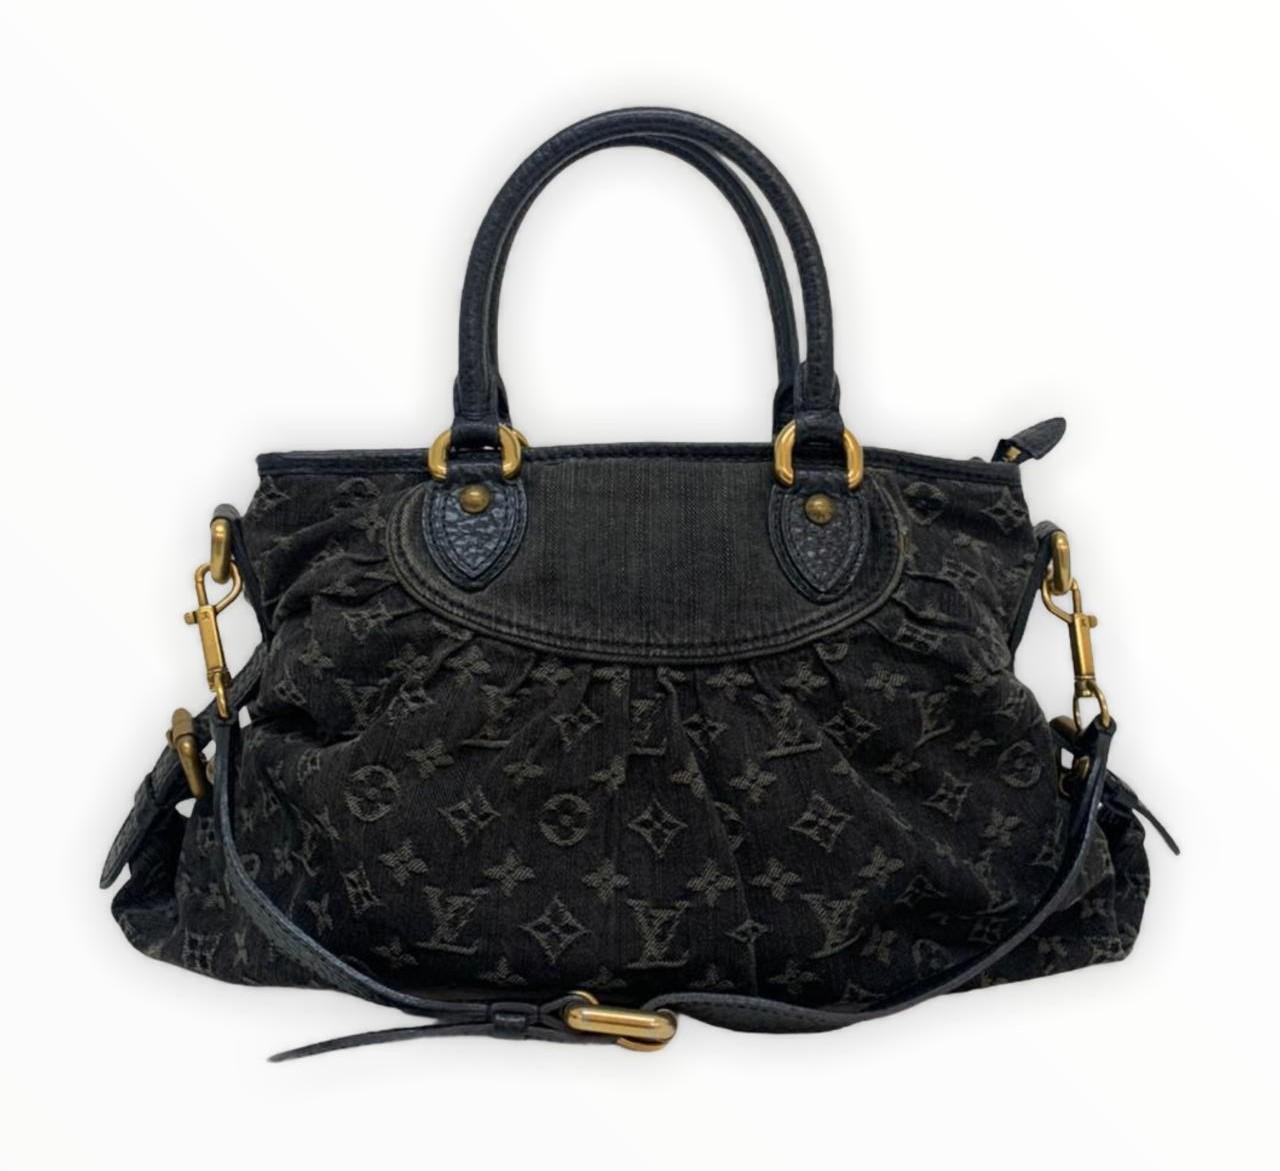 Bolsa Louis Vuitton Black Monogram Denim Neo Cabby